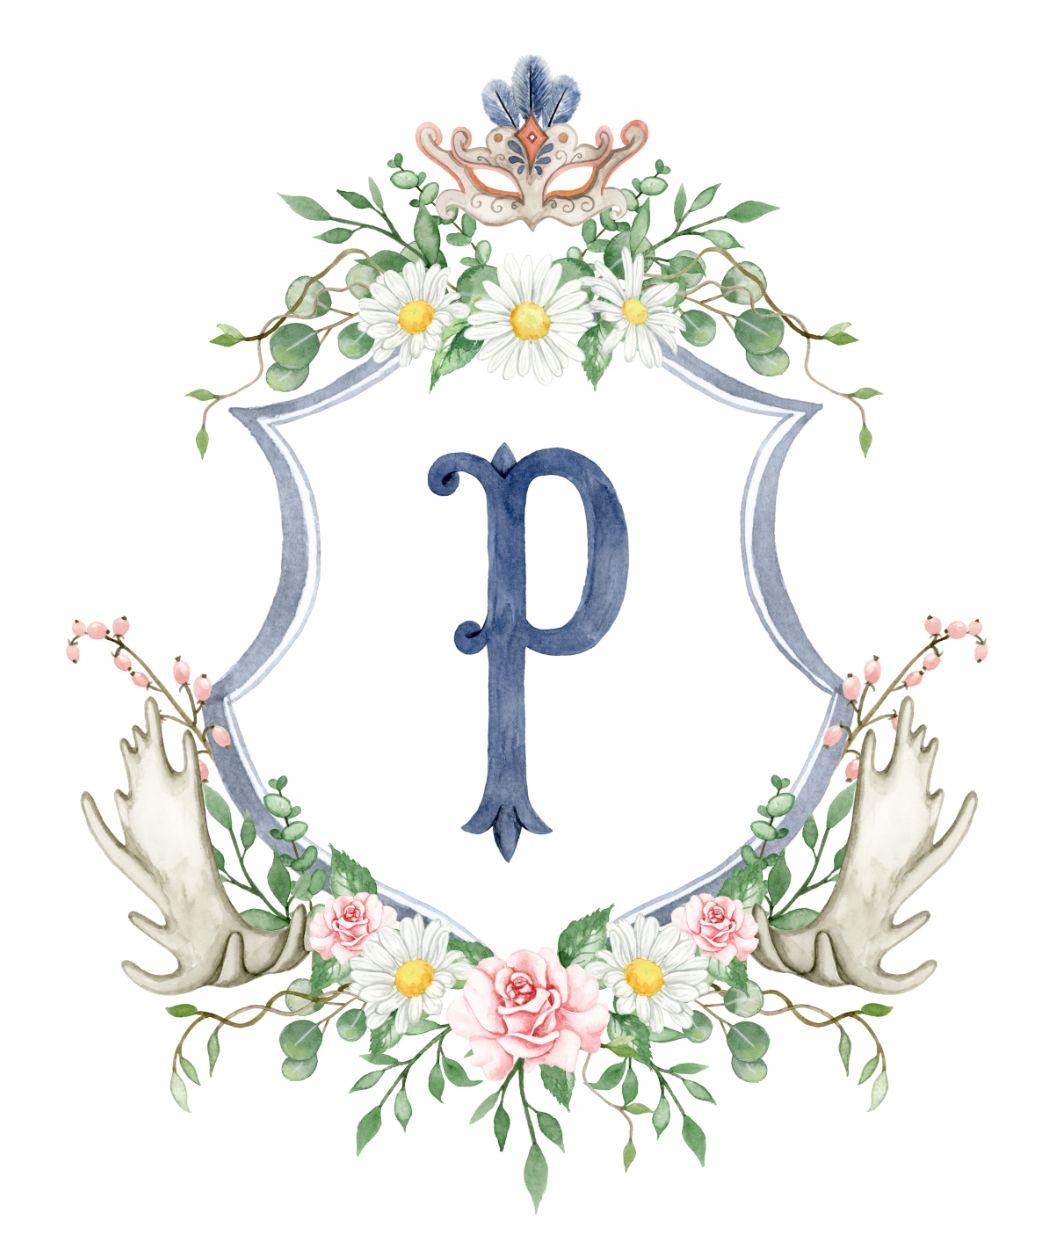 Pin On Lana Dreams Watercolor Crests